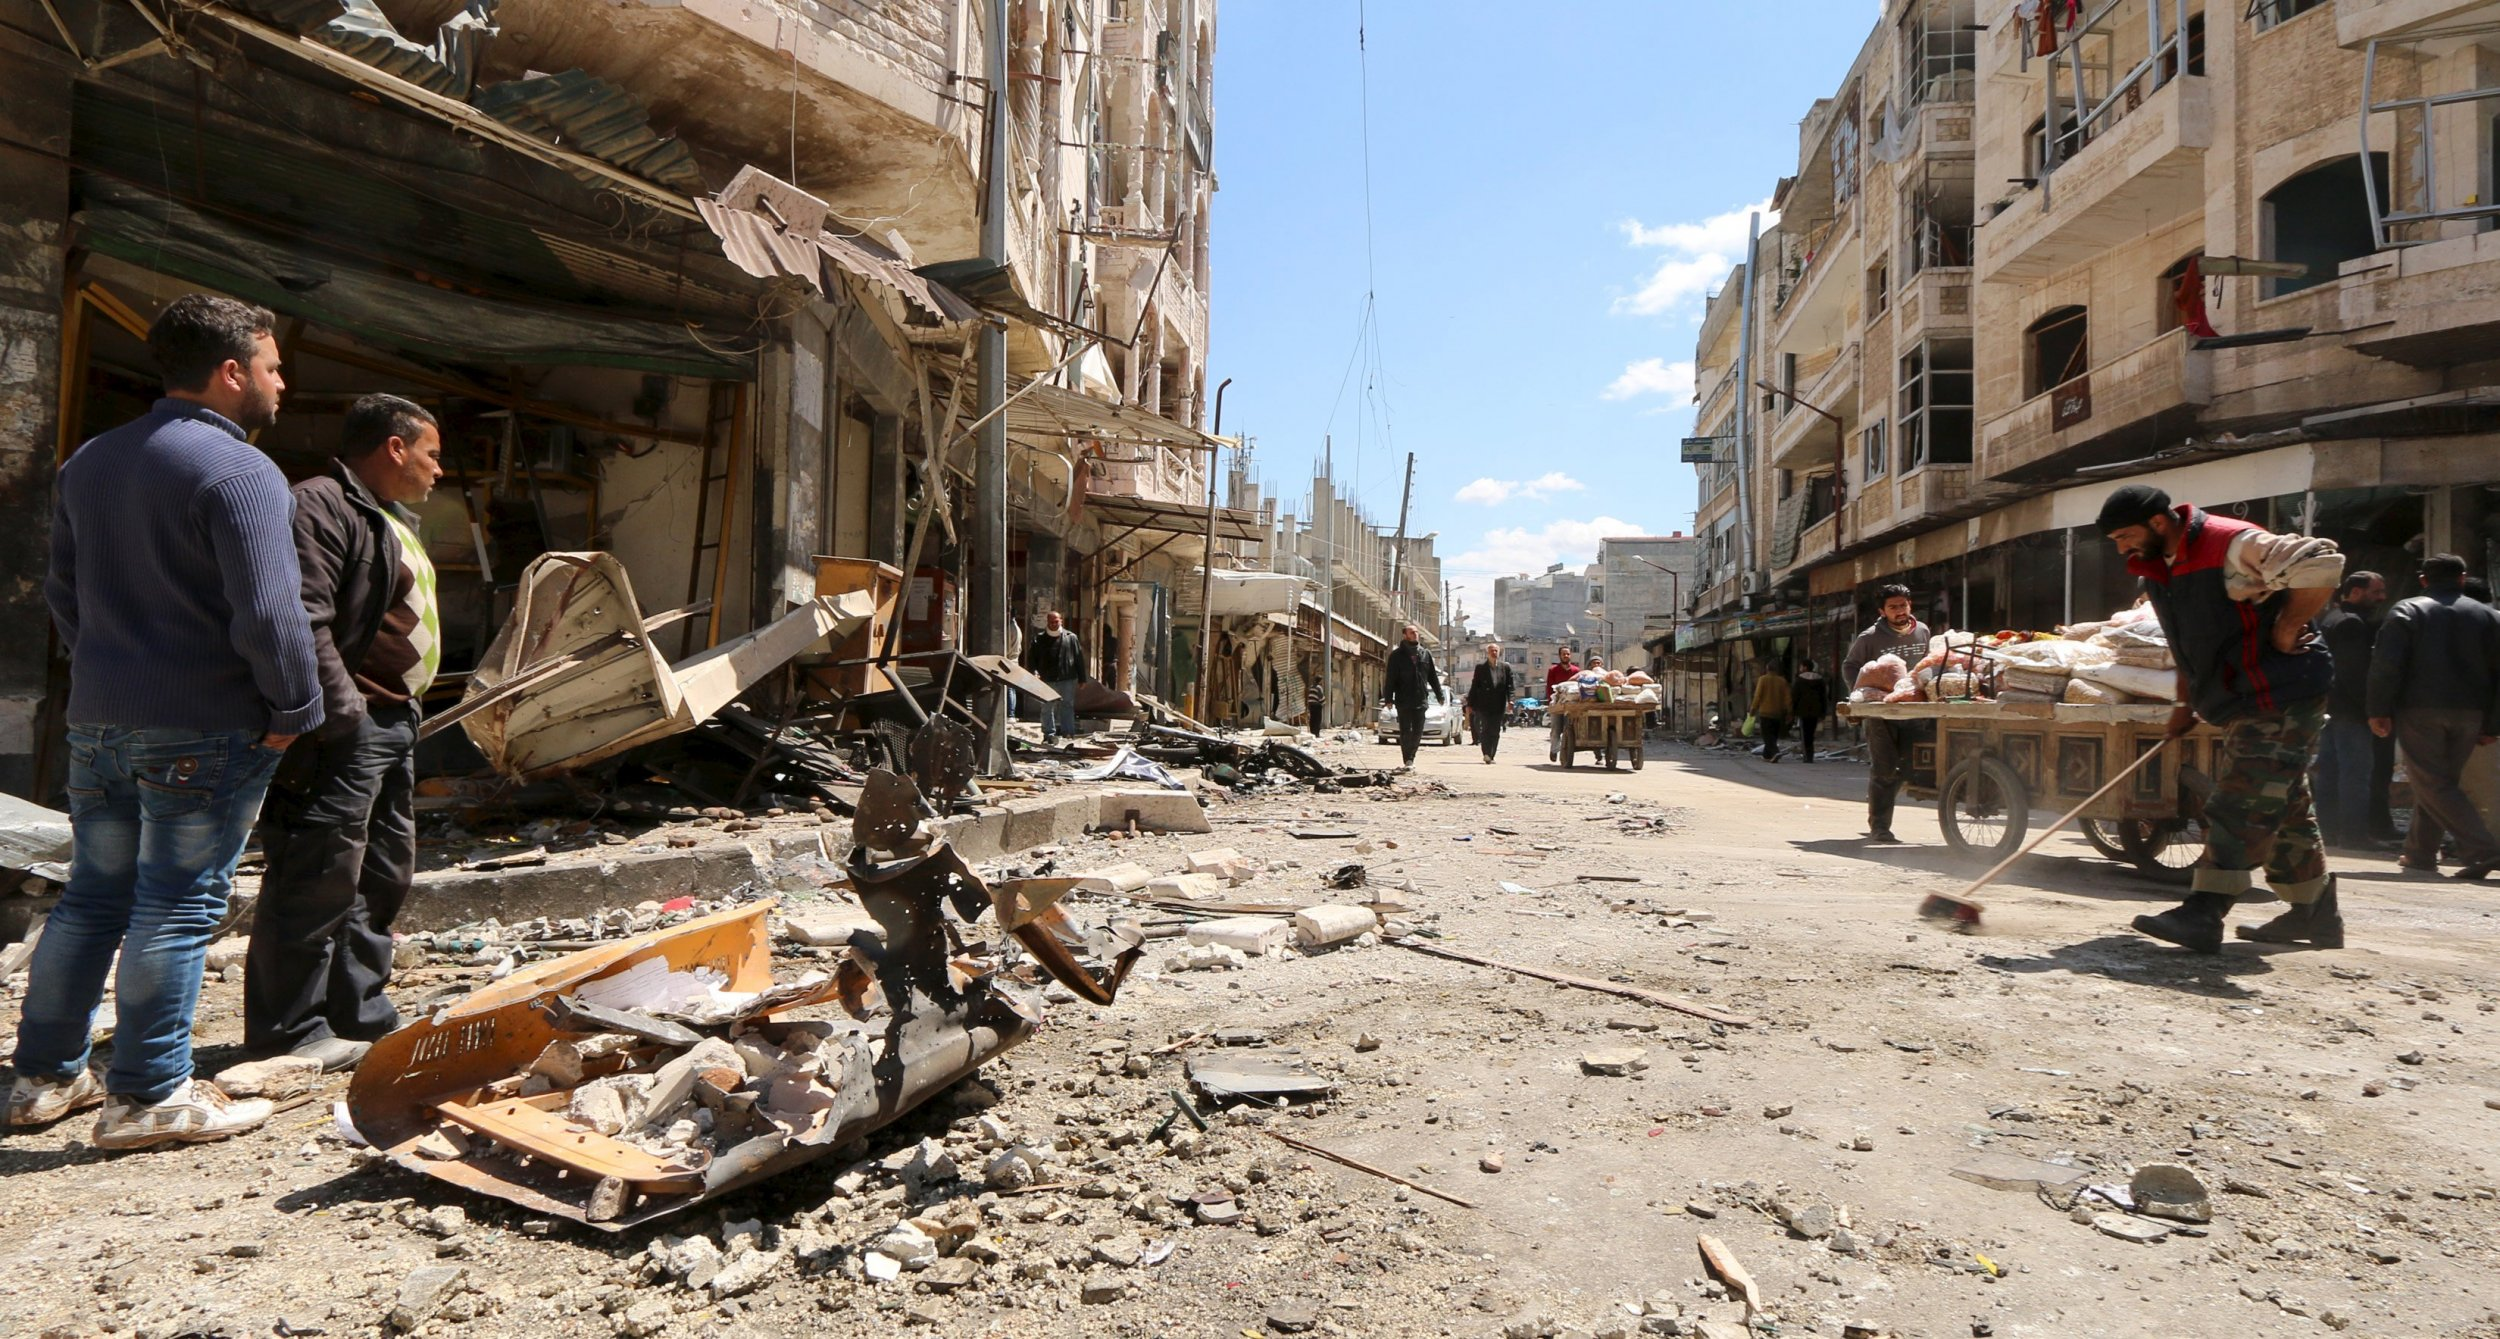 2015-04-14T112046Z_141955027_GF10000058454_RTRMADP_3_MIDEAST-CRISIS-SYRIA